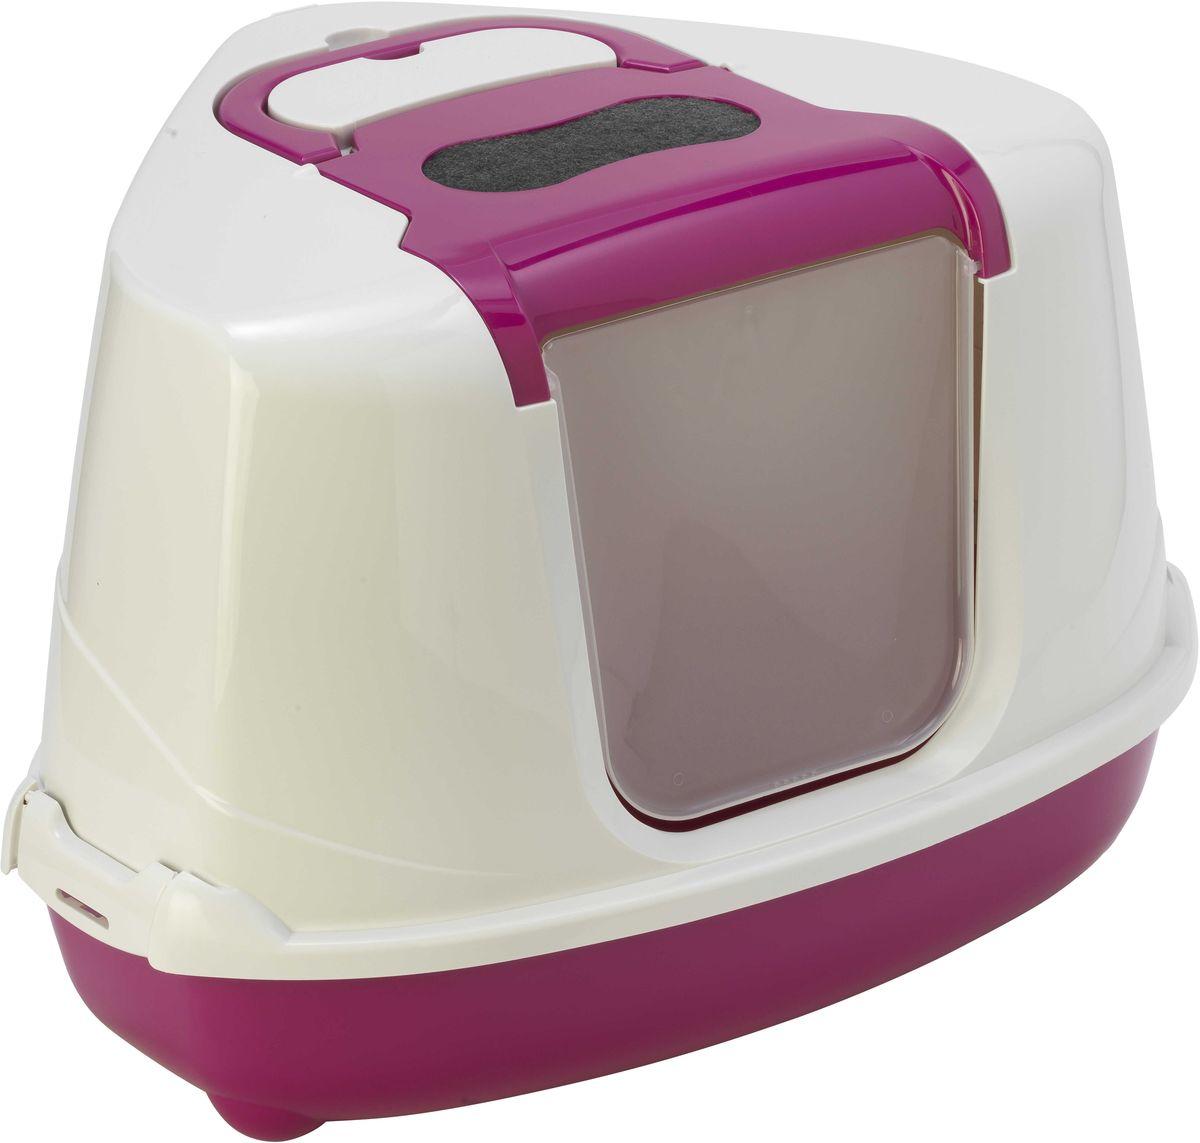 Туалет для кошек Moderna Flip Corner, закрытый, угловой, цвет: ярко-розовый, 56 х 45 х 39 см luxury stand flip